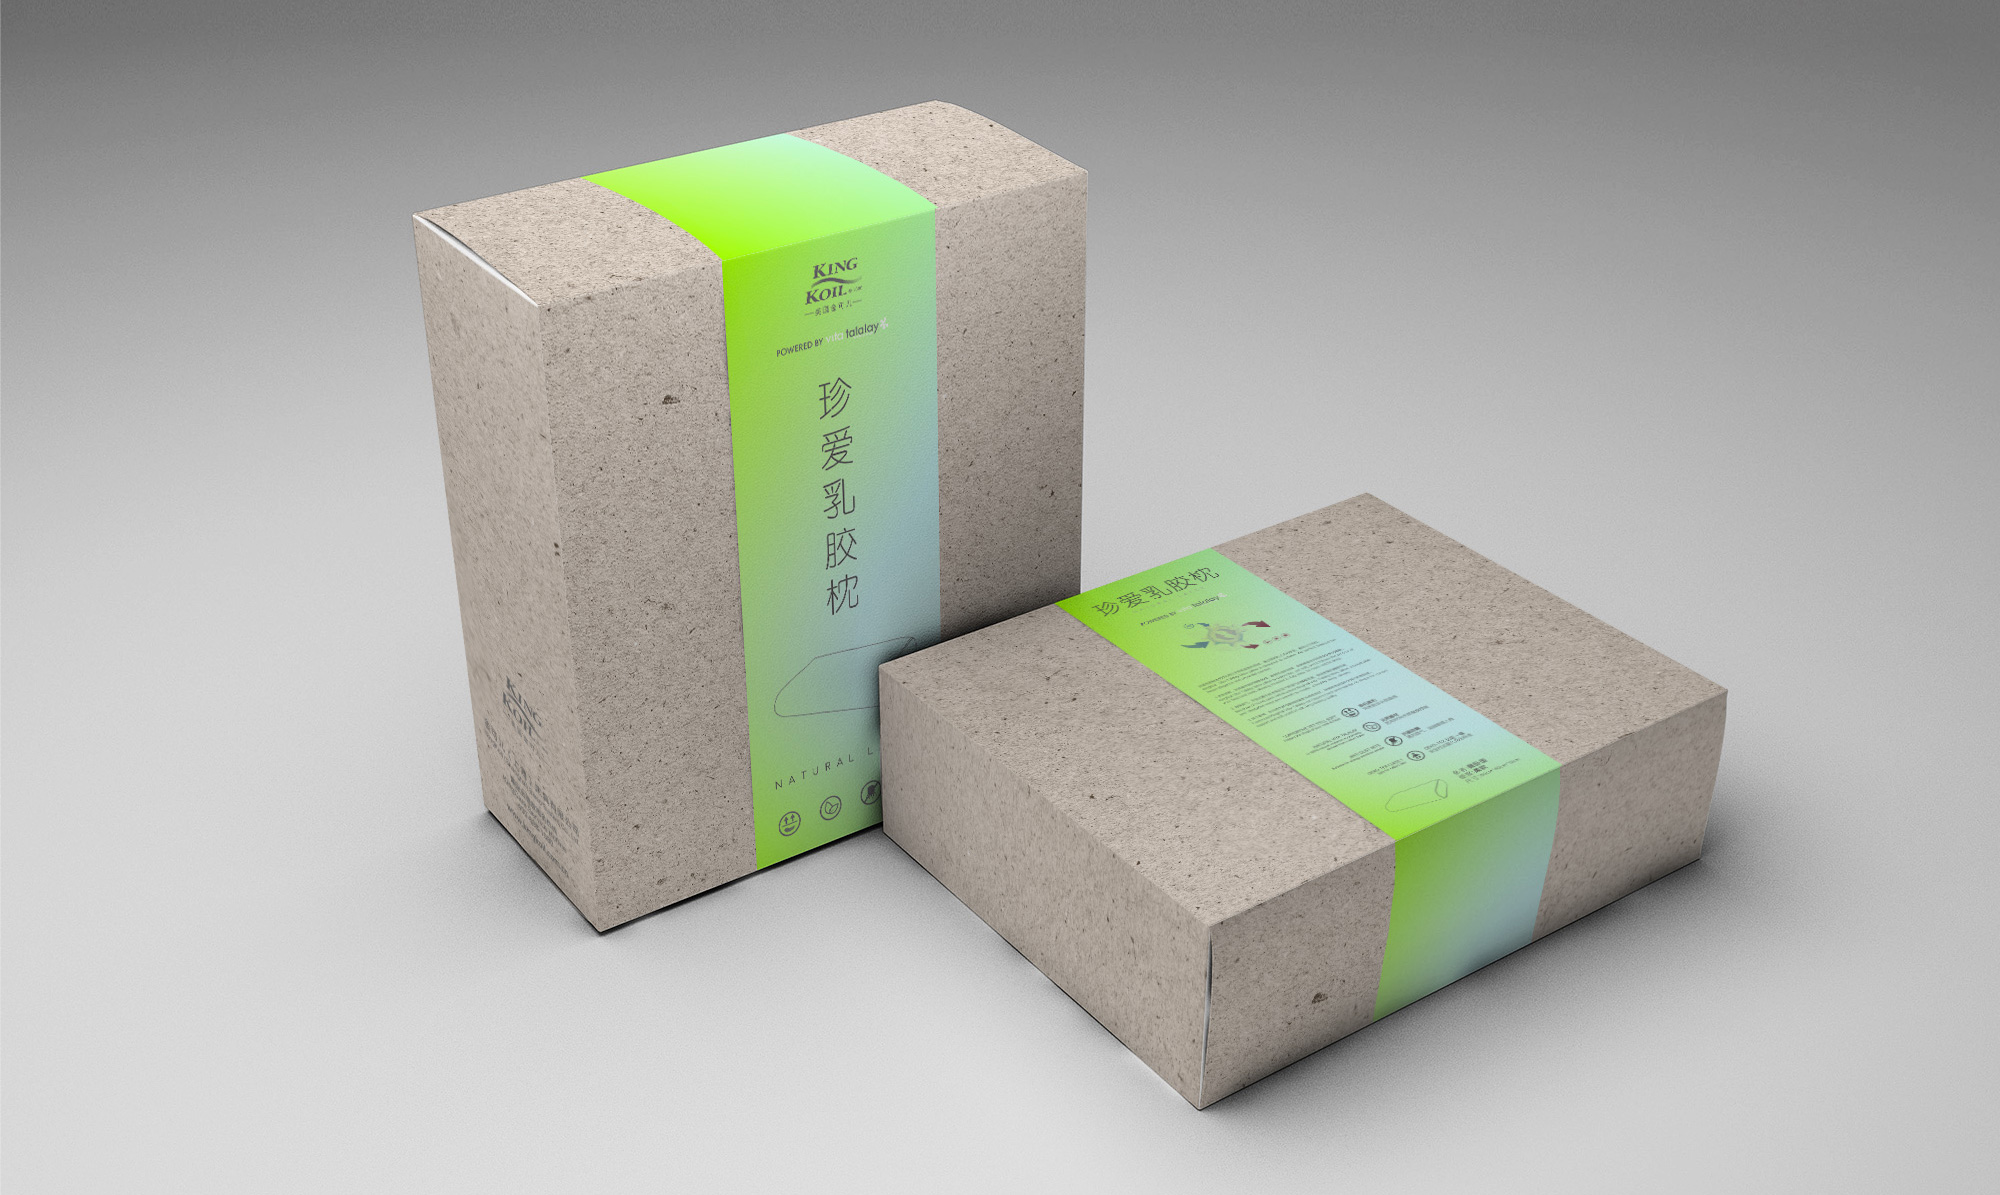 quentin_paquignon-packaging-kingkoilchina_04.jpg